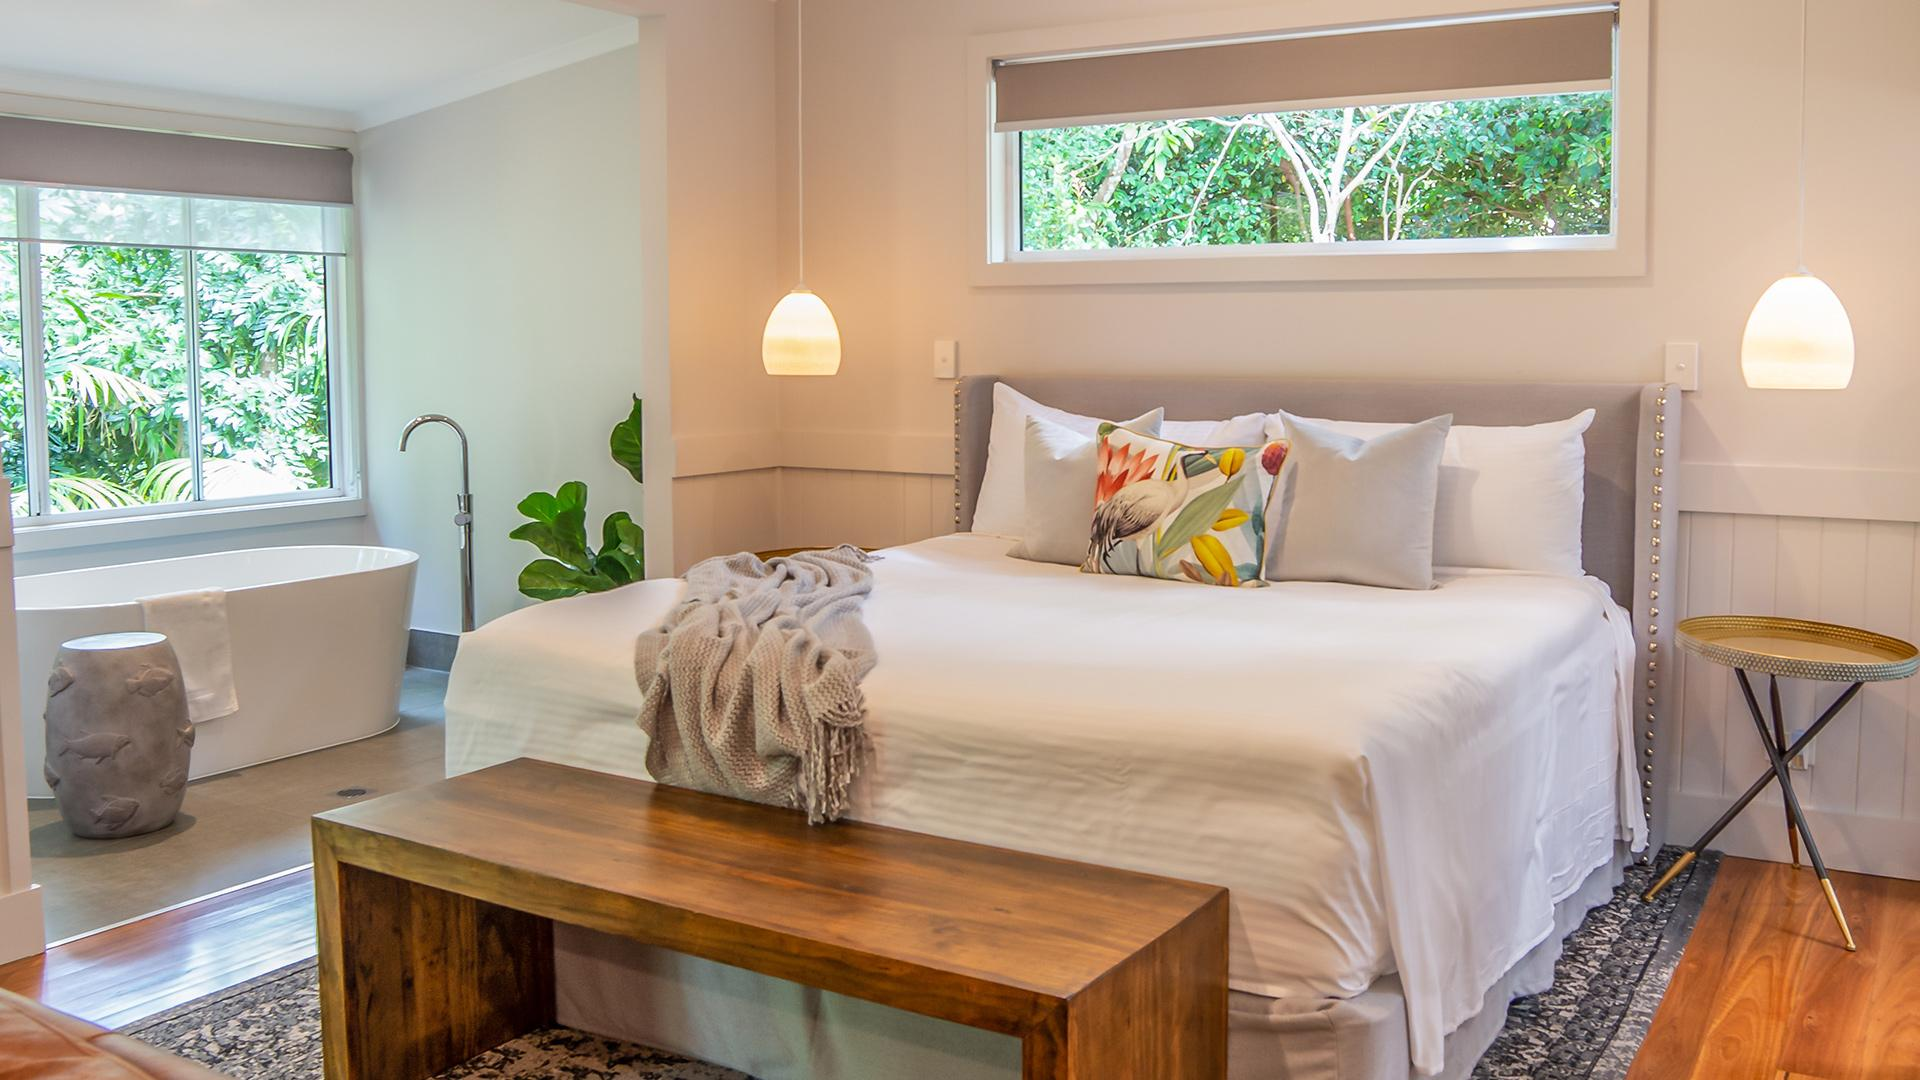 One-Bedroom Cottage image 1 at Clouds Montville by Sunshine Coast Regional, Queensland, Australia